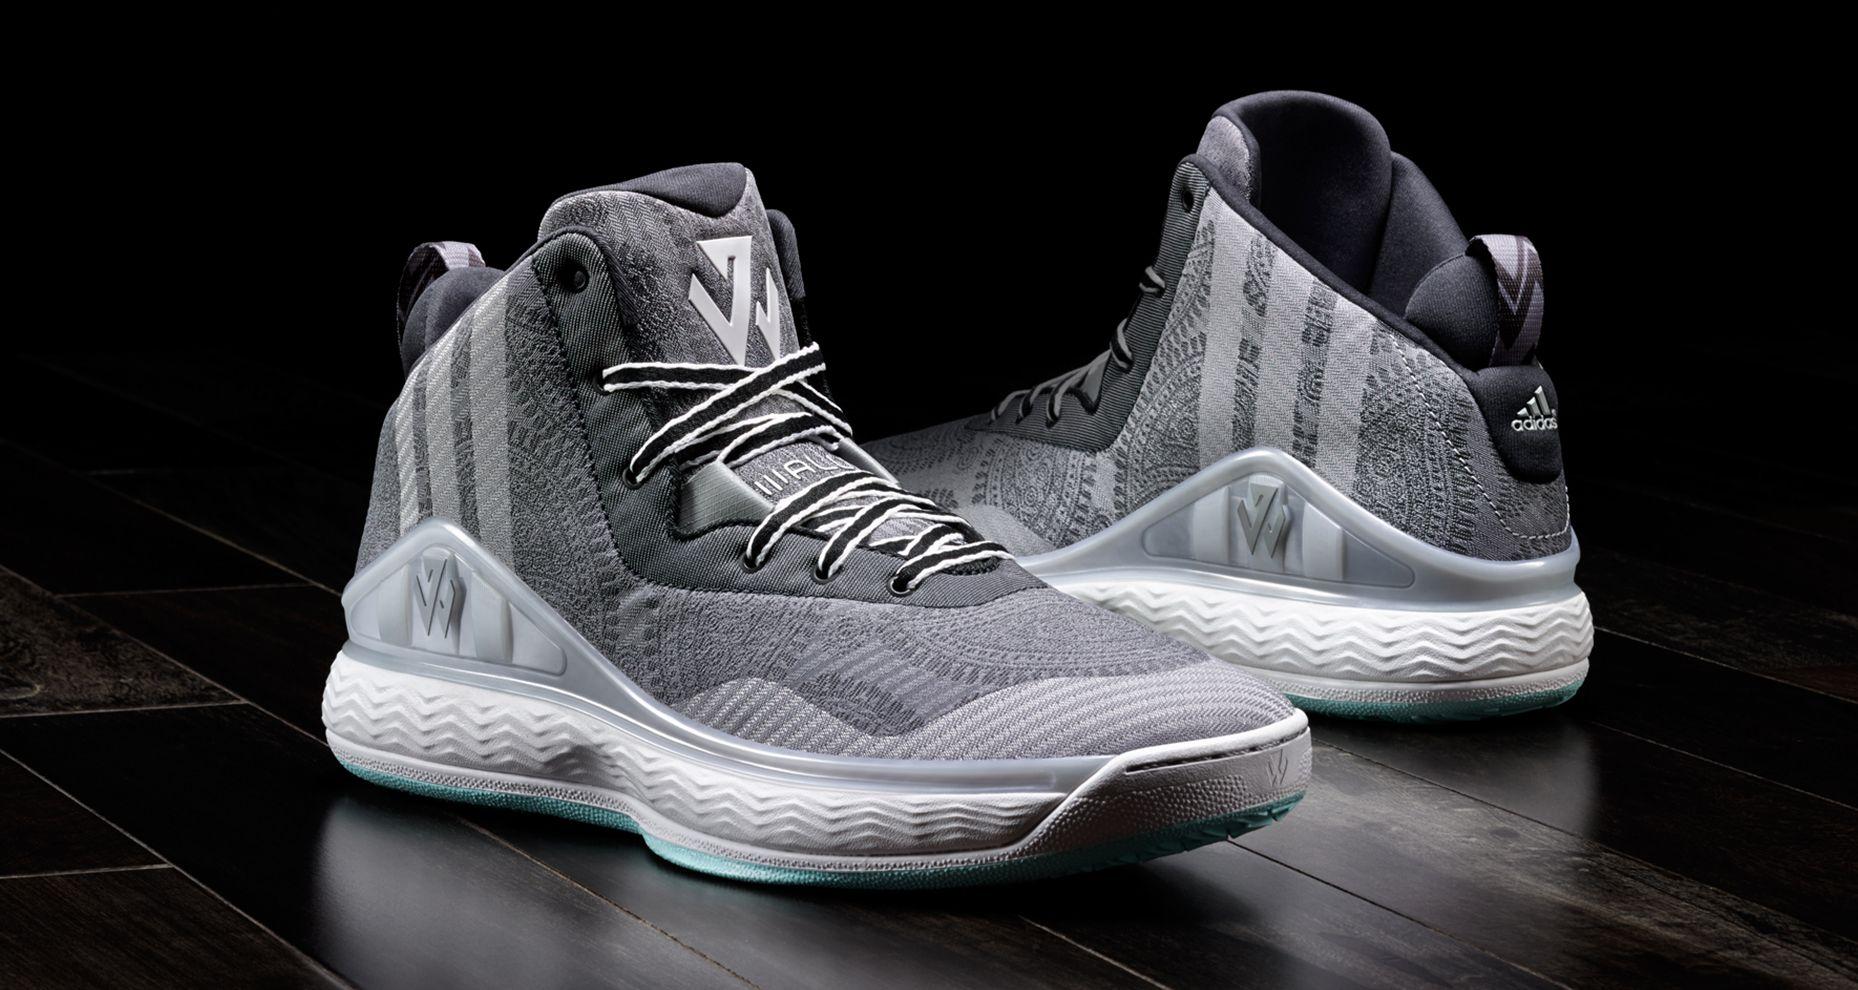 adidas j wall 1 woven paisley sneakers john wall on john wall id=48732